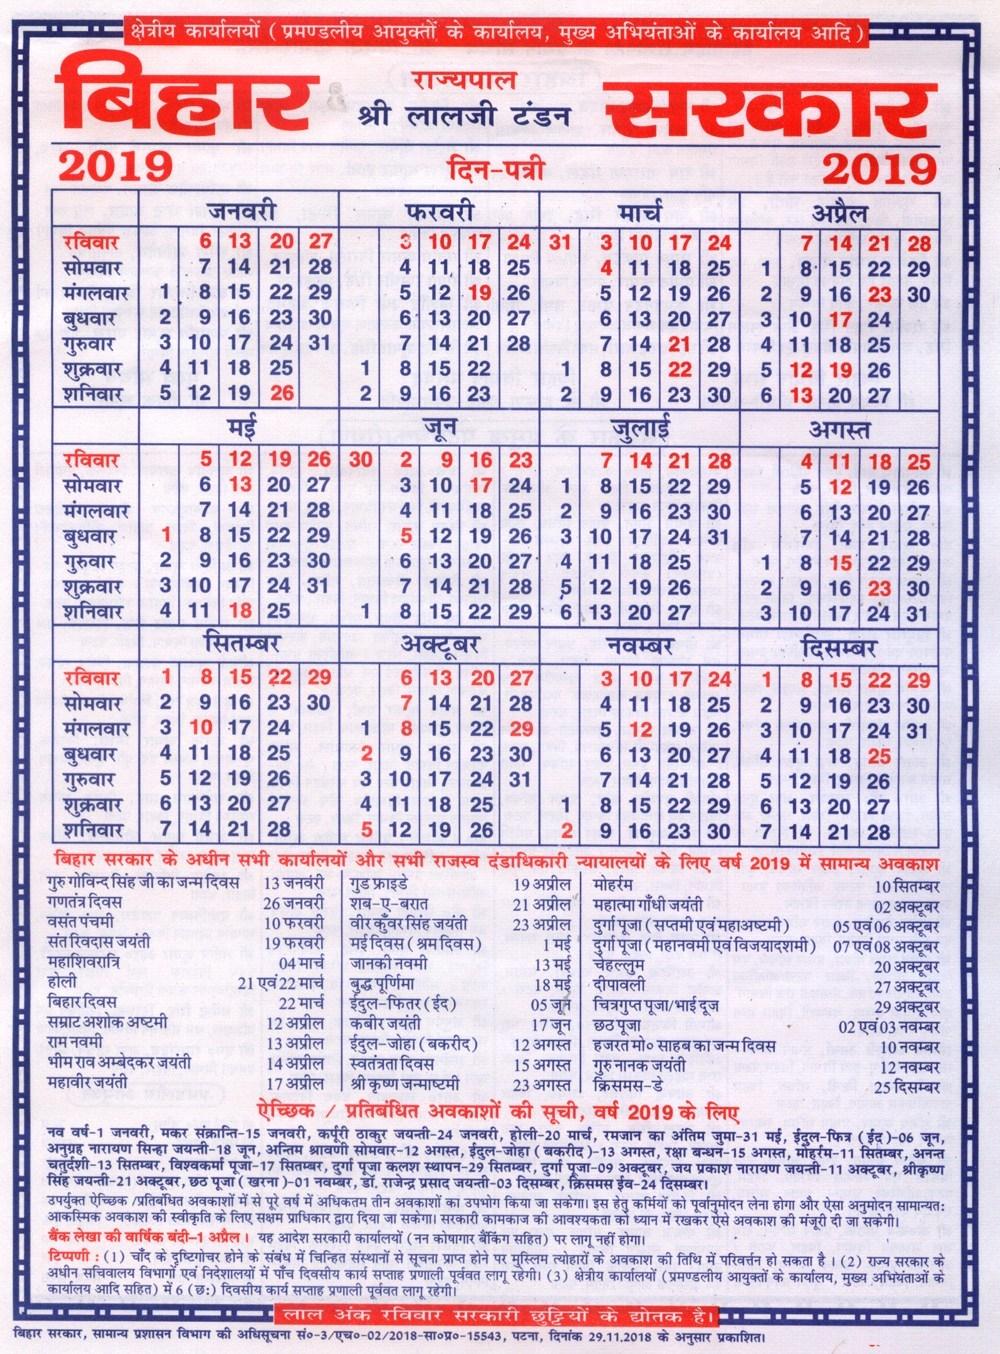 Bihar_Government_Calendar2019 | Bihar School pertaining to Bihar Goverment Calender 2020